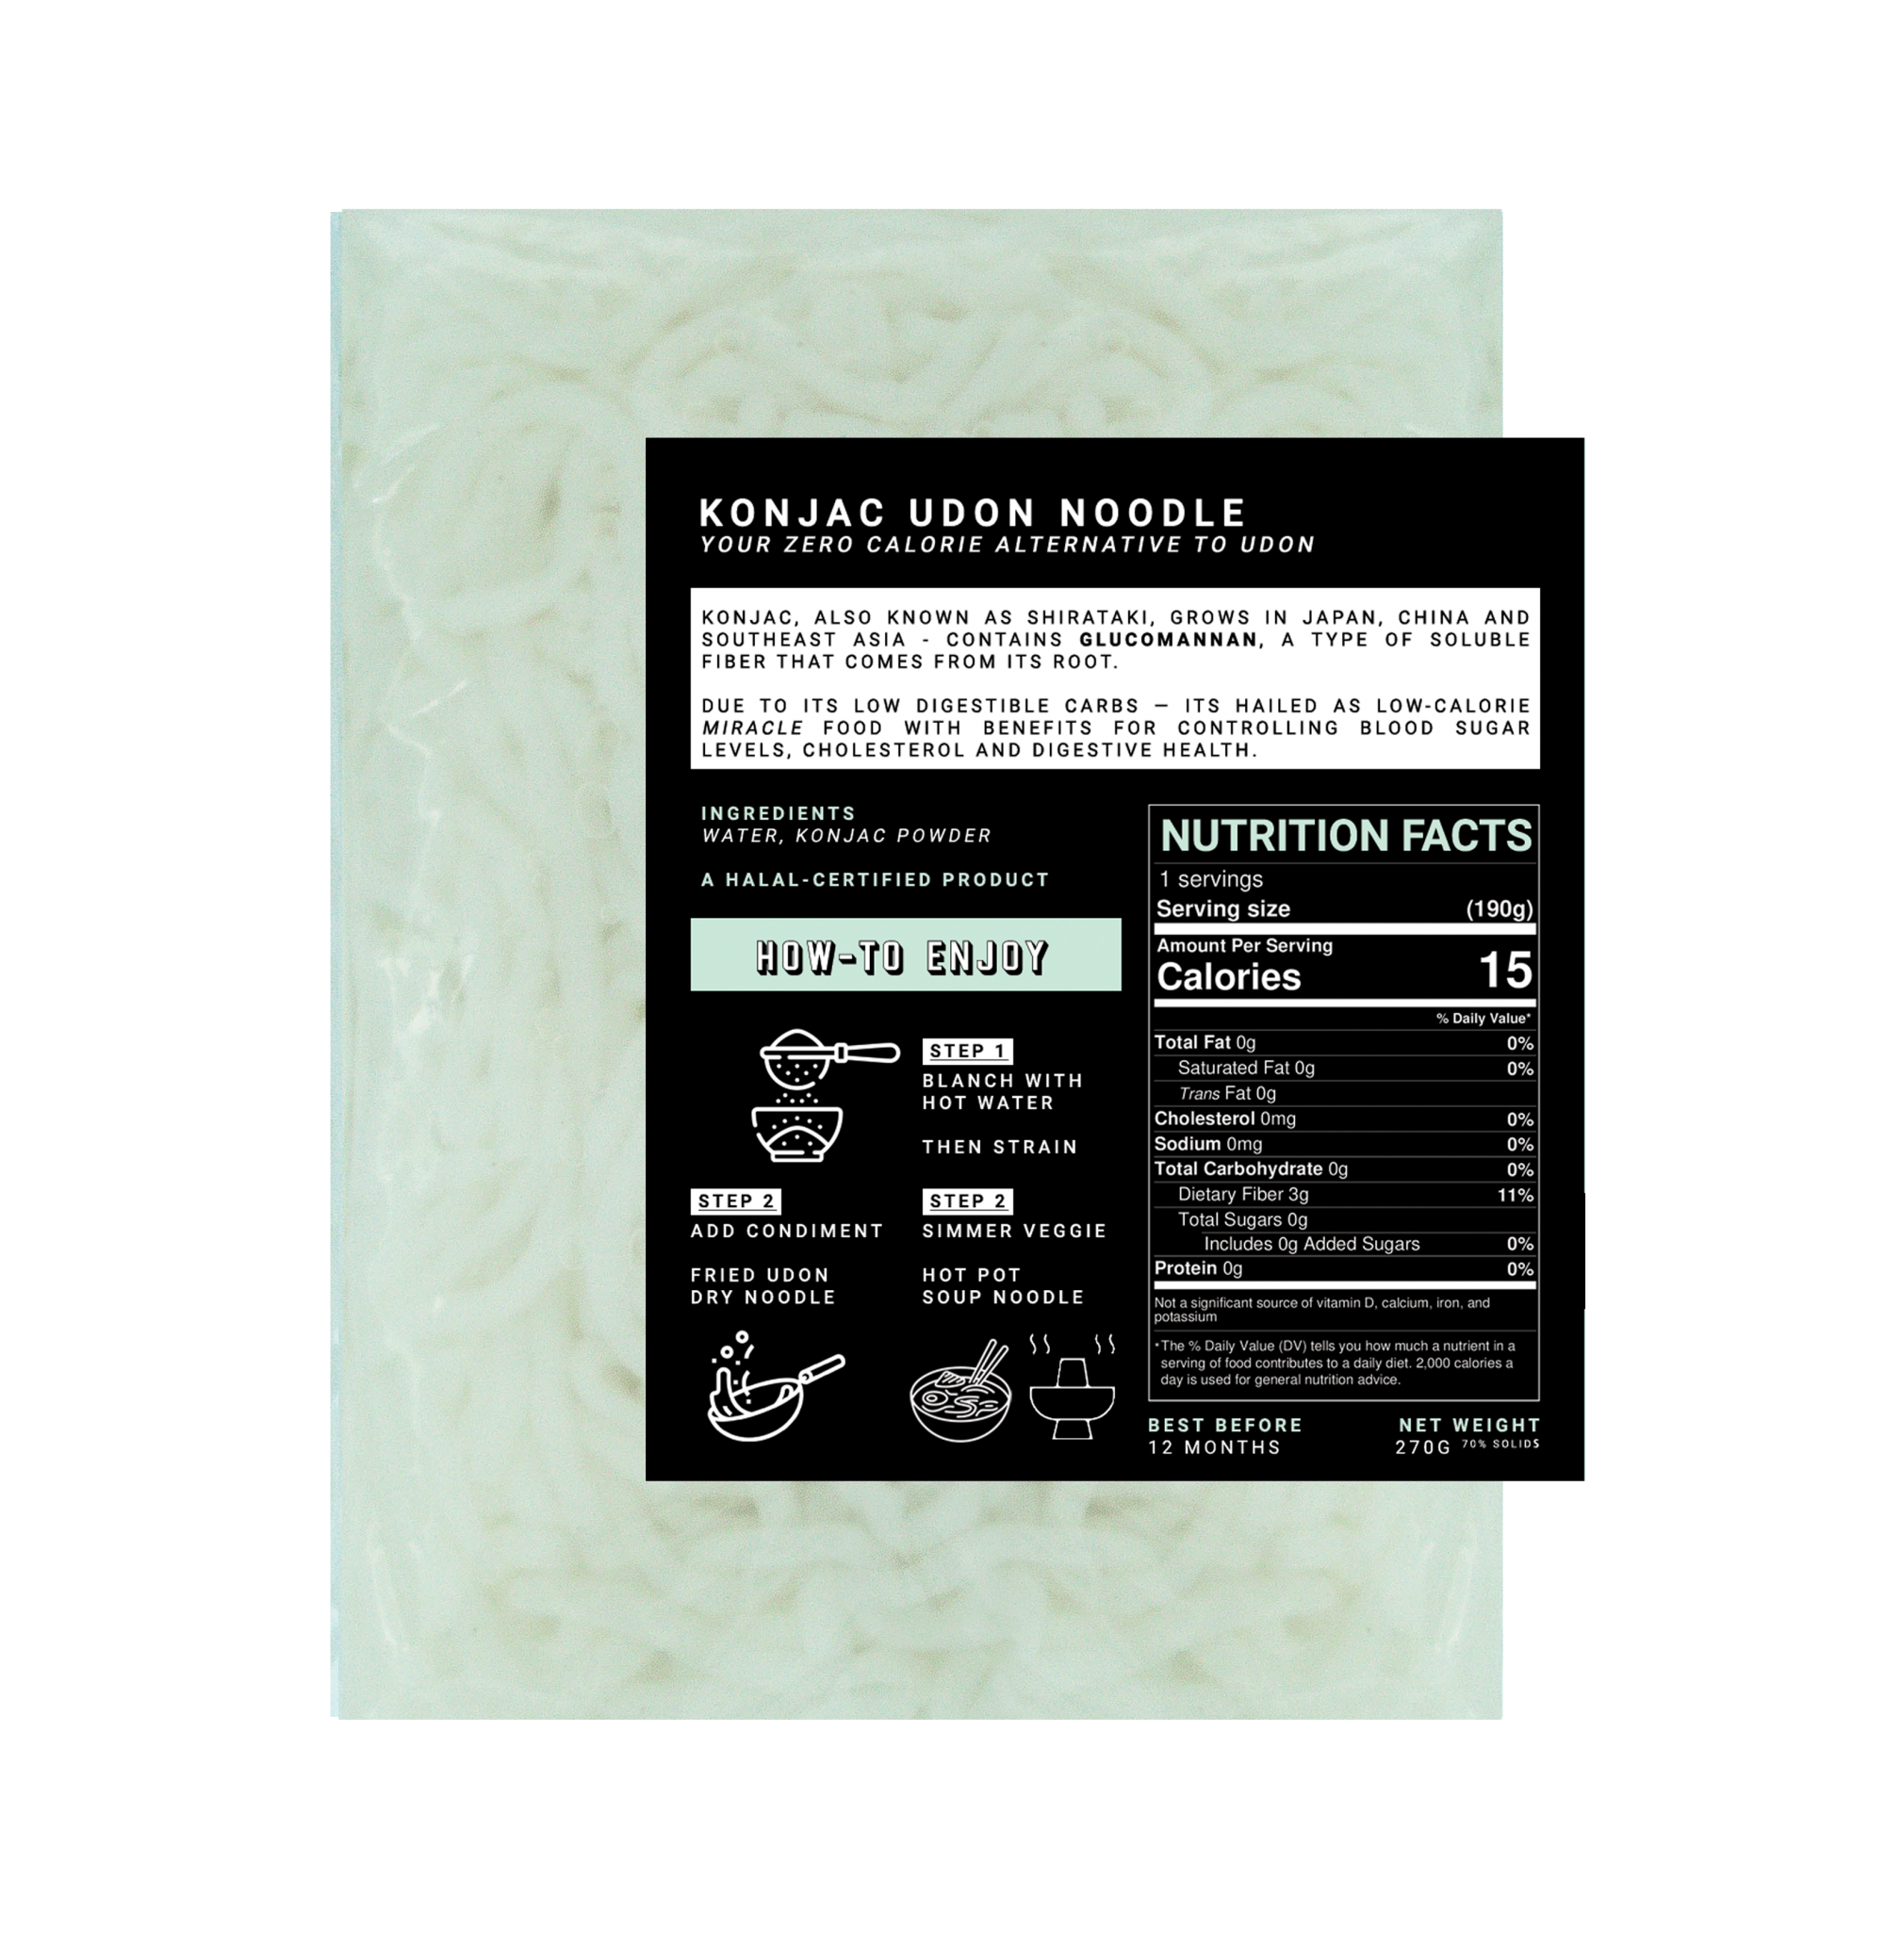 Konjac Udon Noodle | Shirataki Keto Diet Malaysia